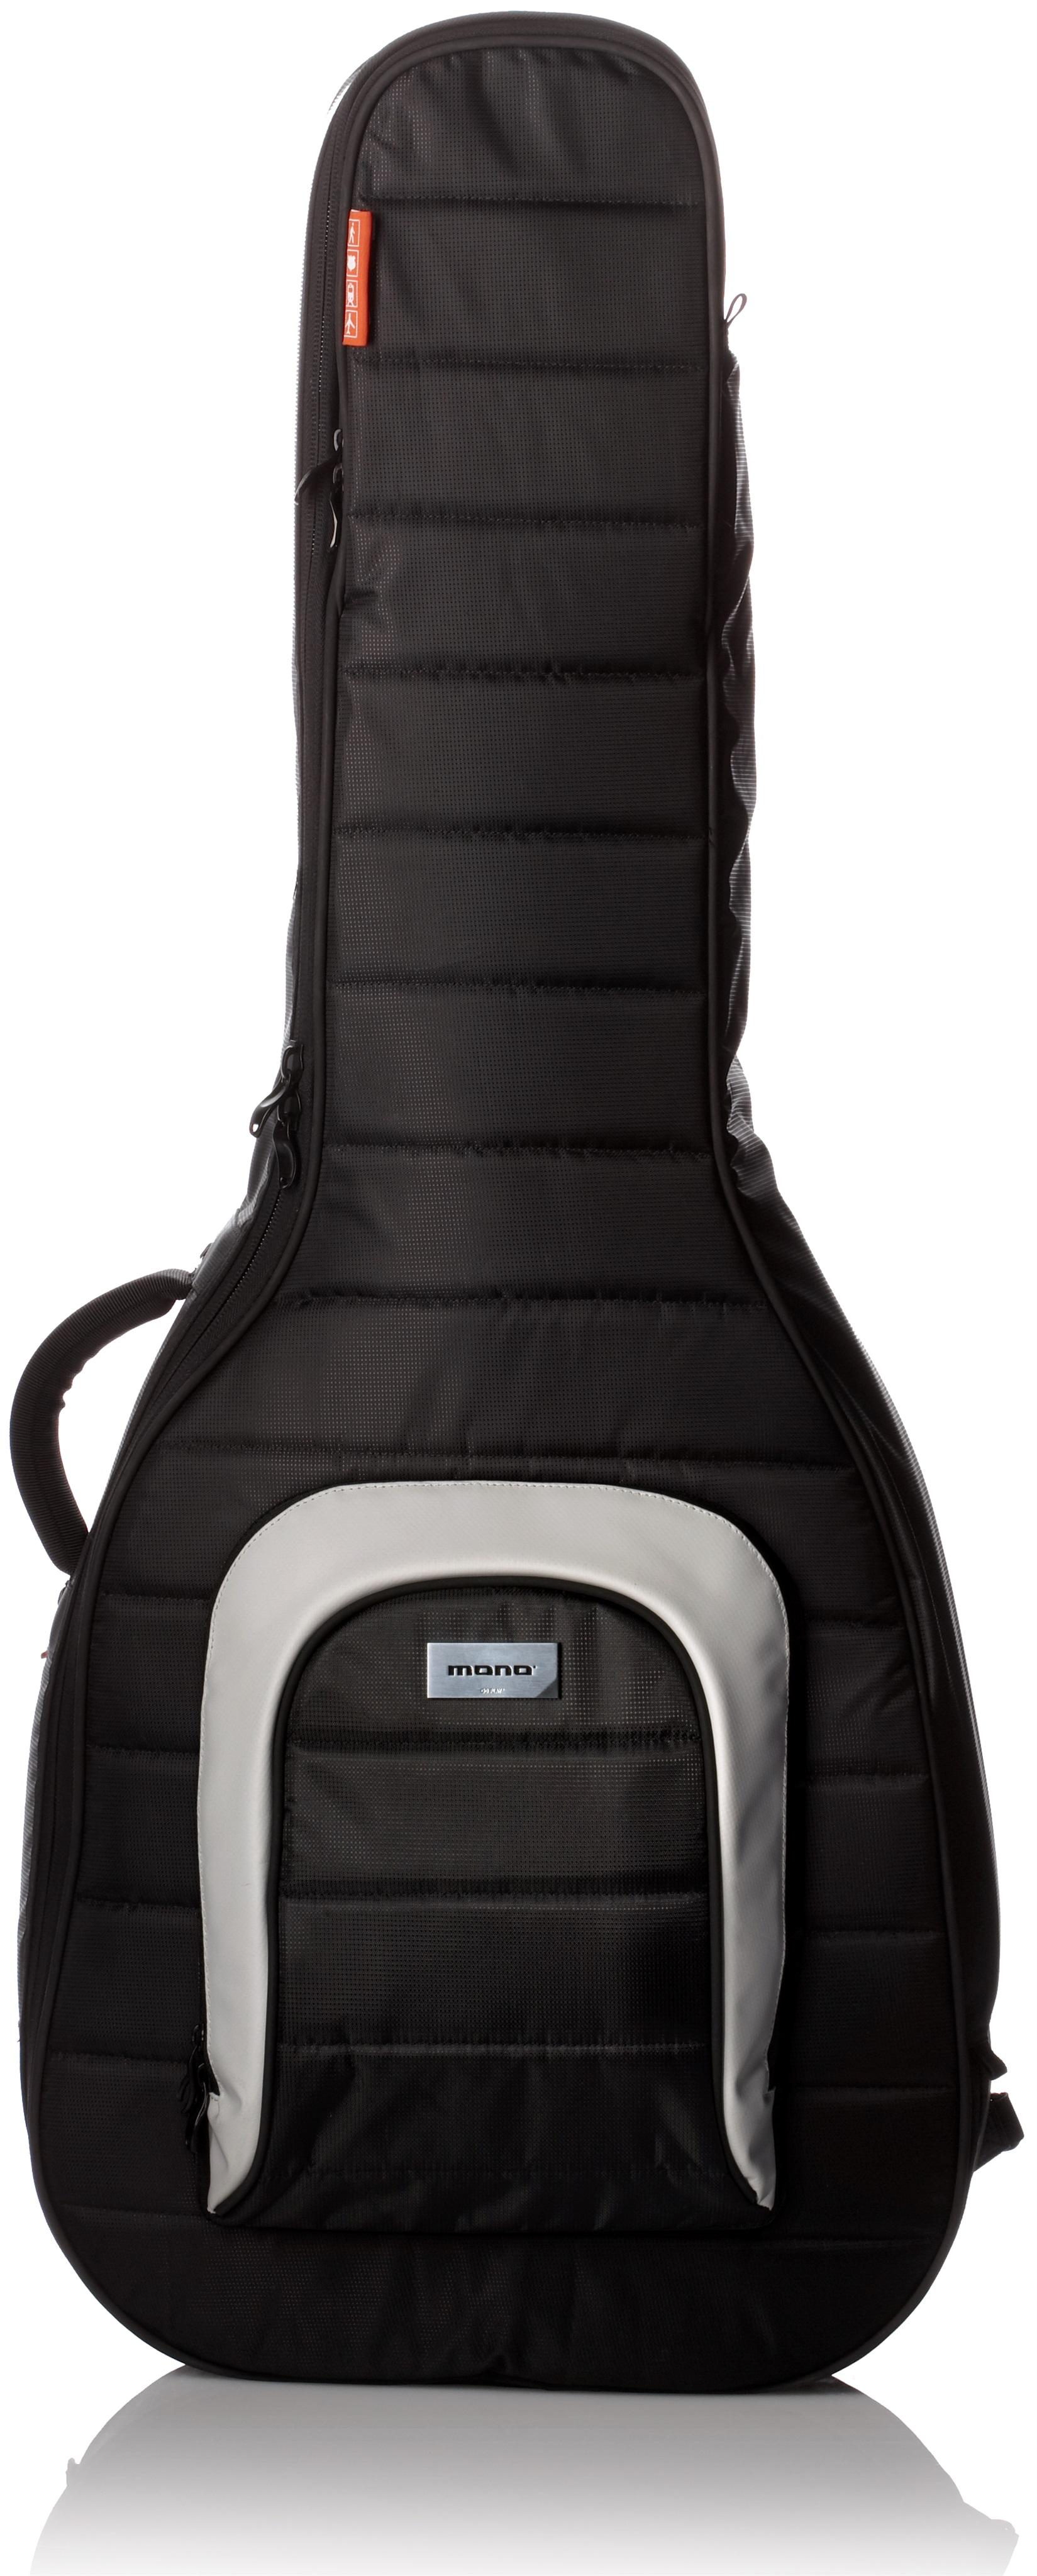 Mono Acoustic